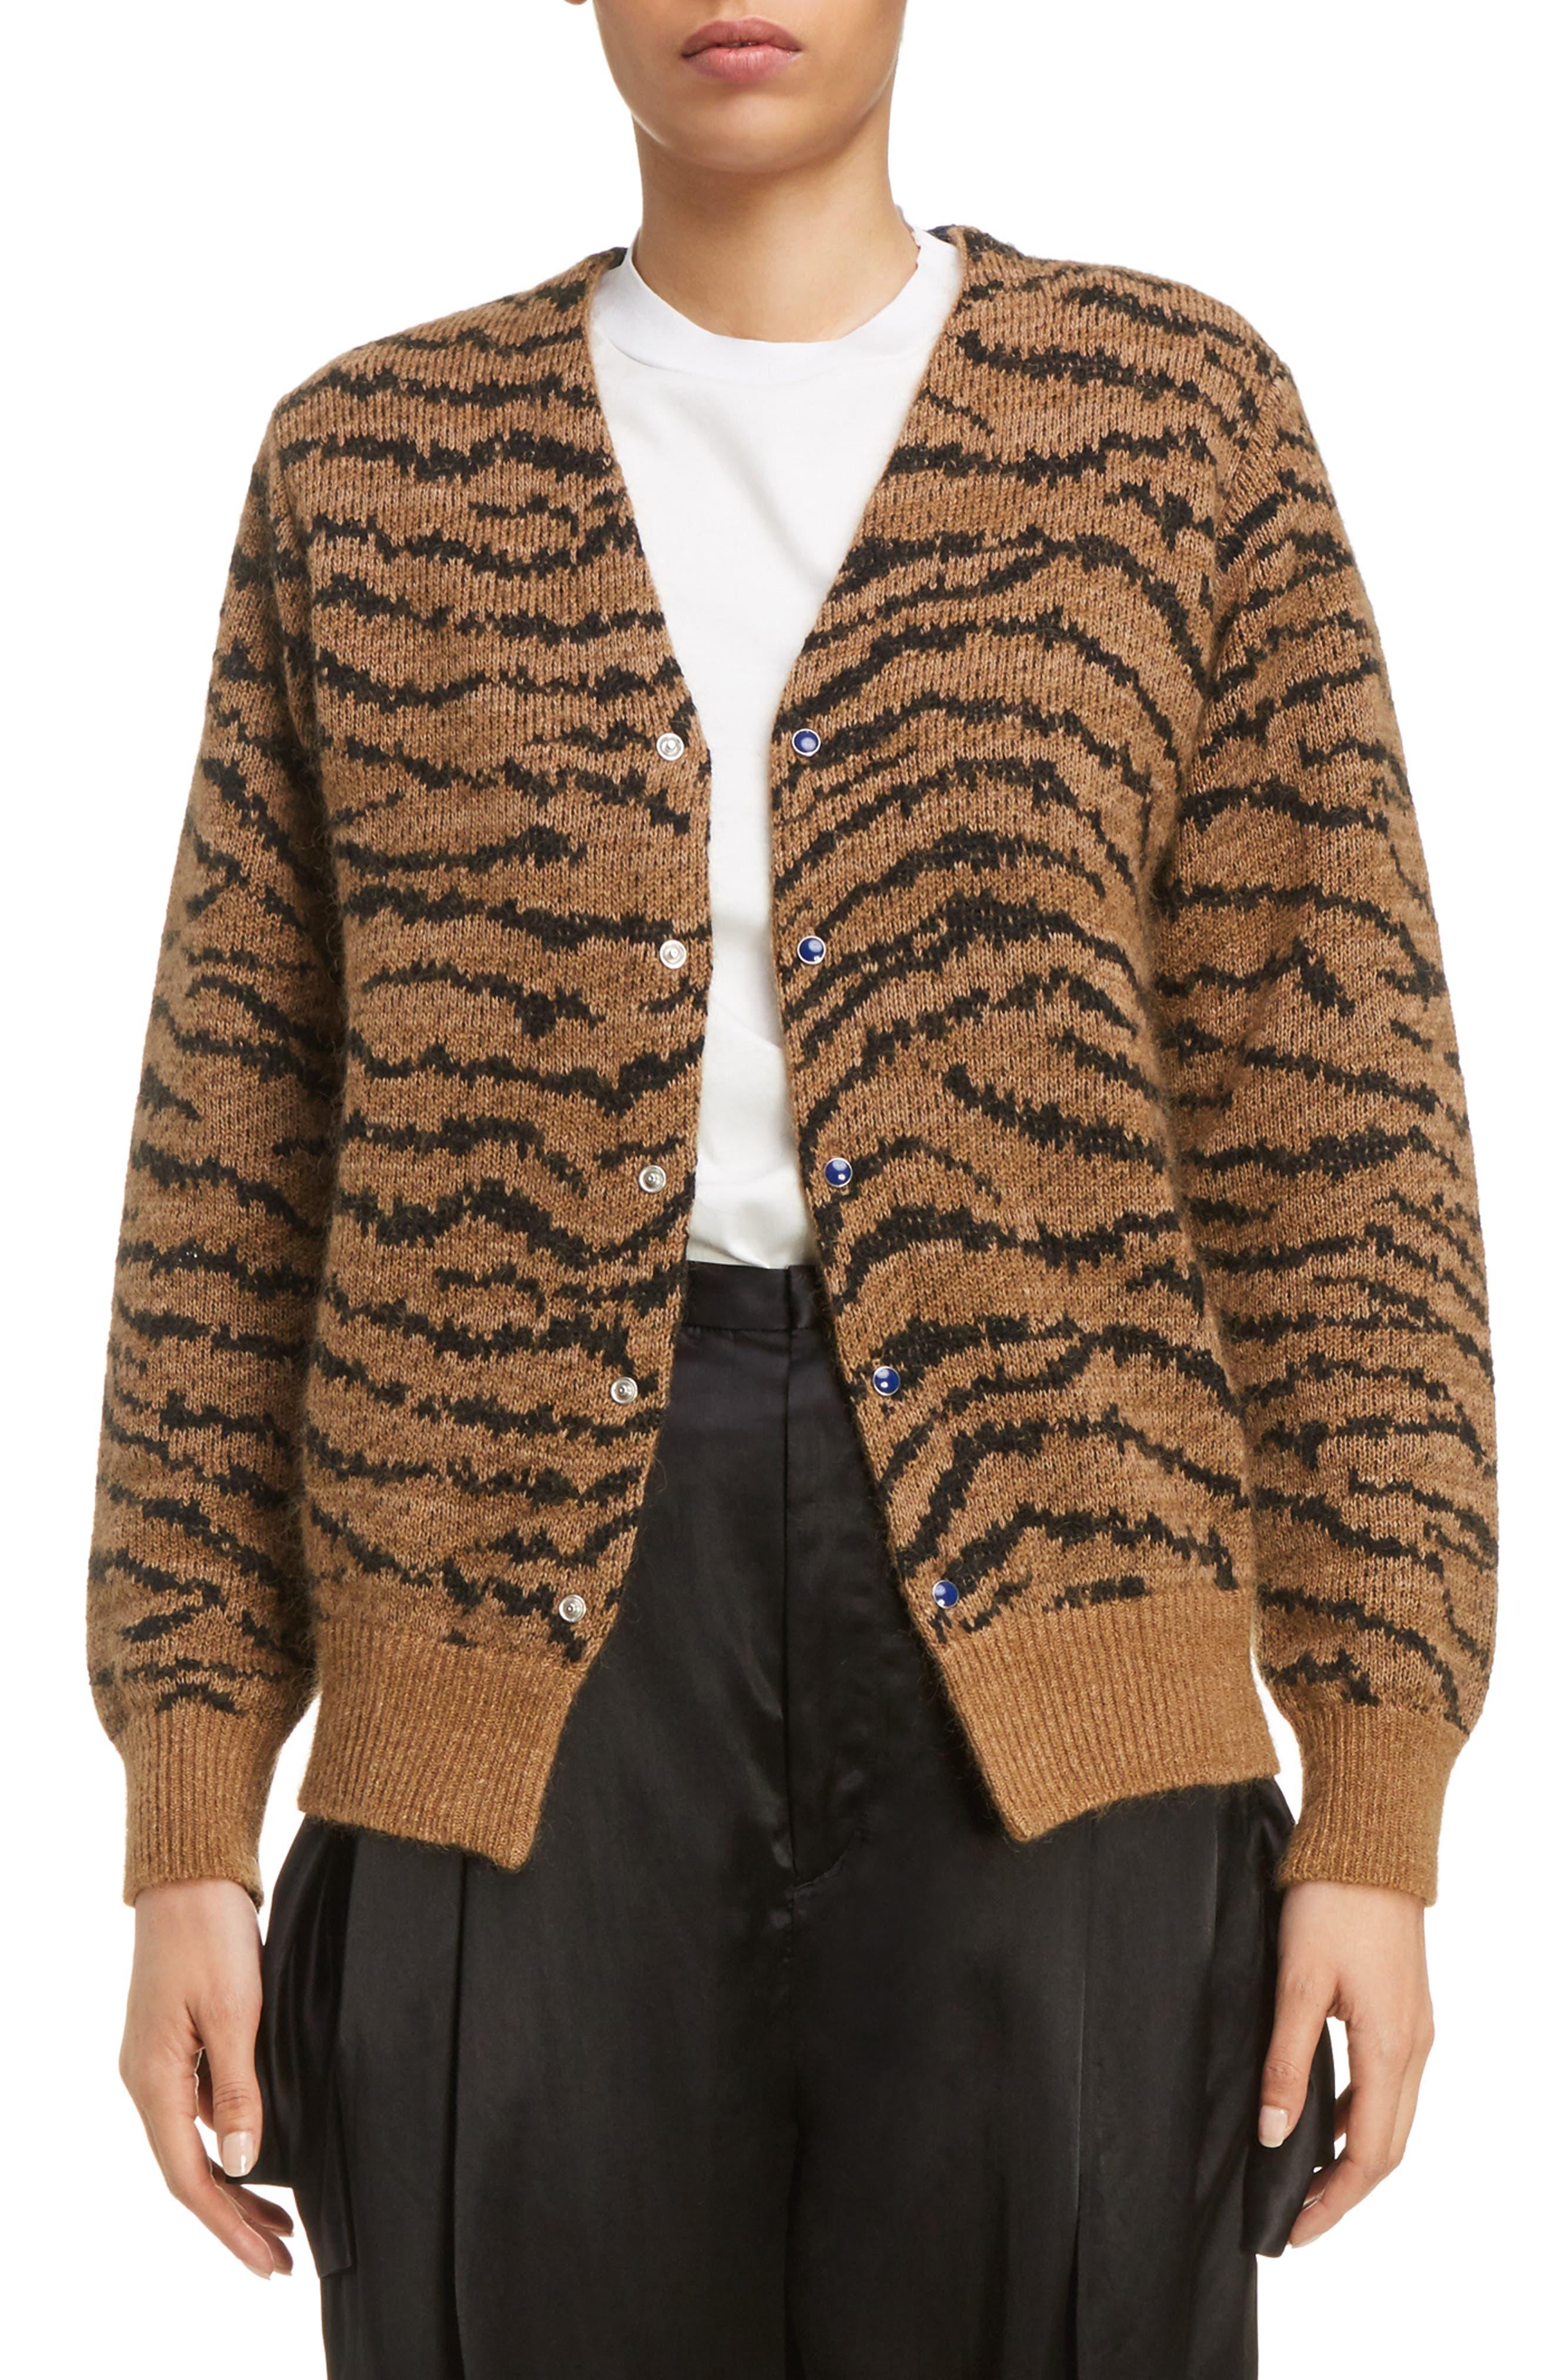 Main Image - TOGA Tiger Jacquard Knit Button Cardigan